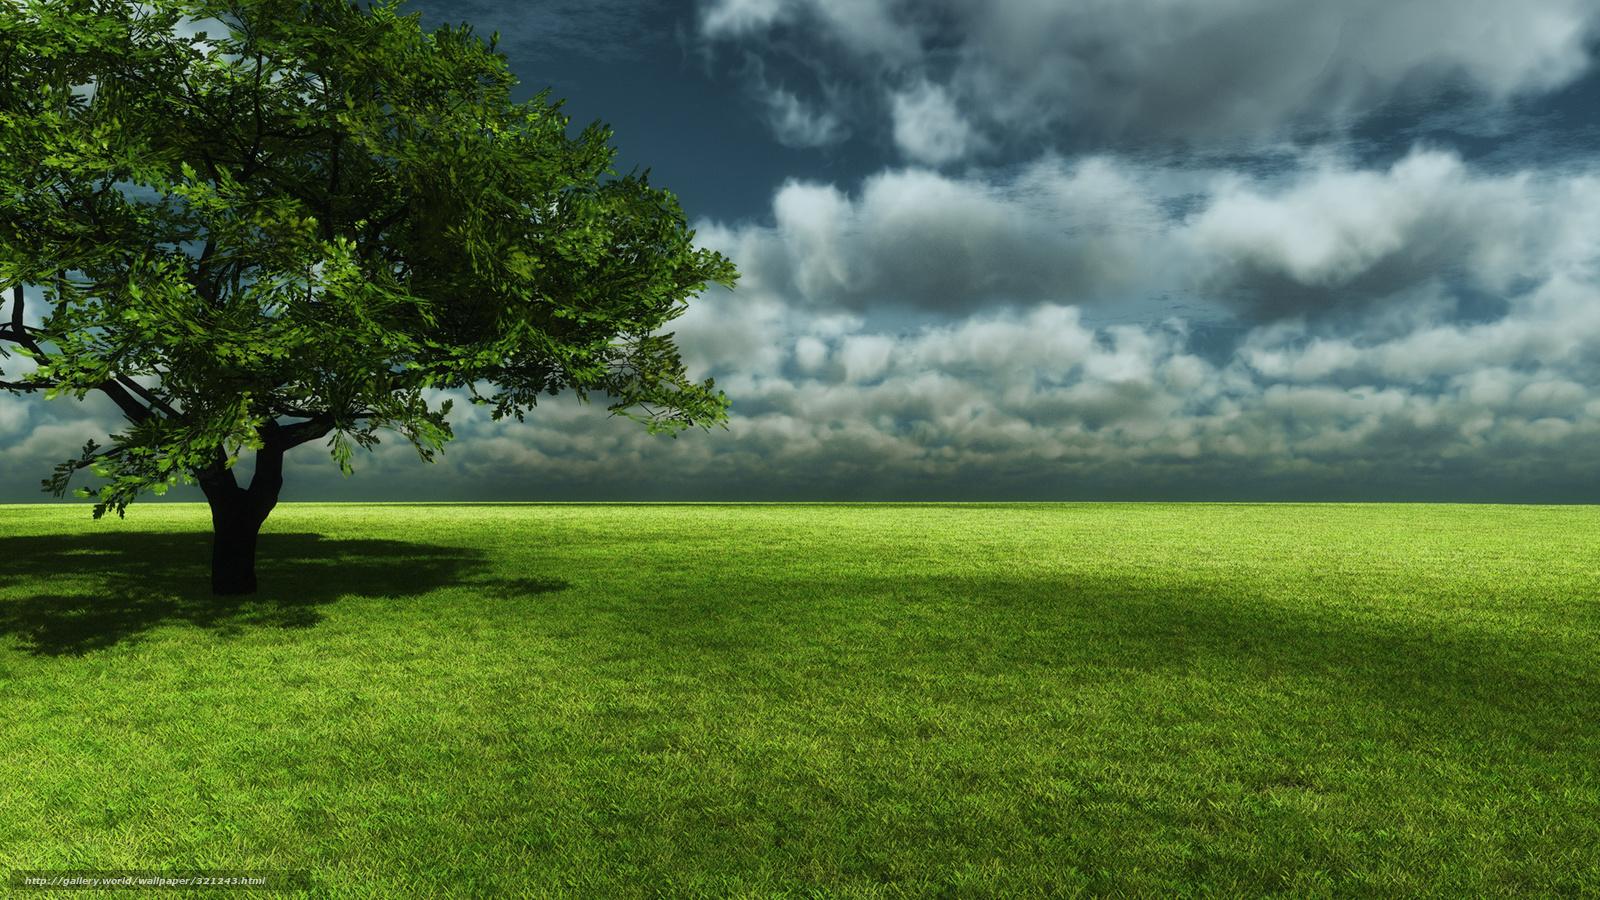 tlcharger fond decran arbre ciel herbe fonds decran gratuits pour votre rsolution du bureau 1920x1080 image 321243 - Arbre Ciel